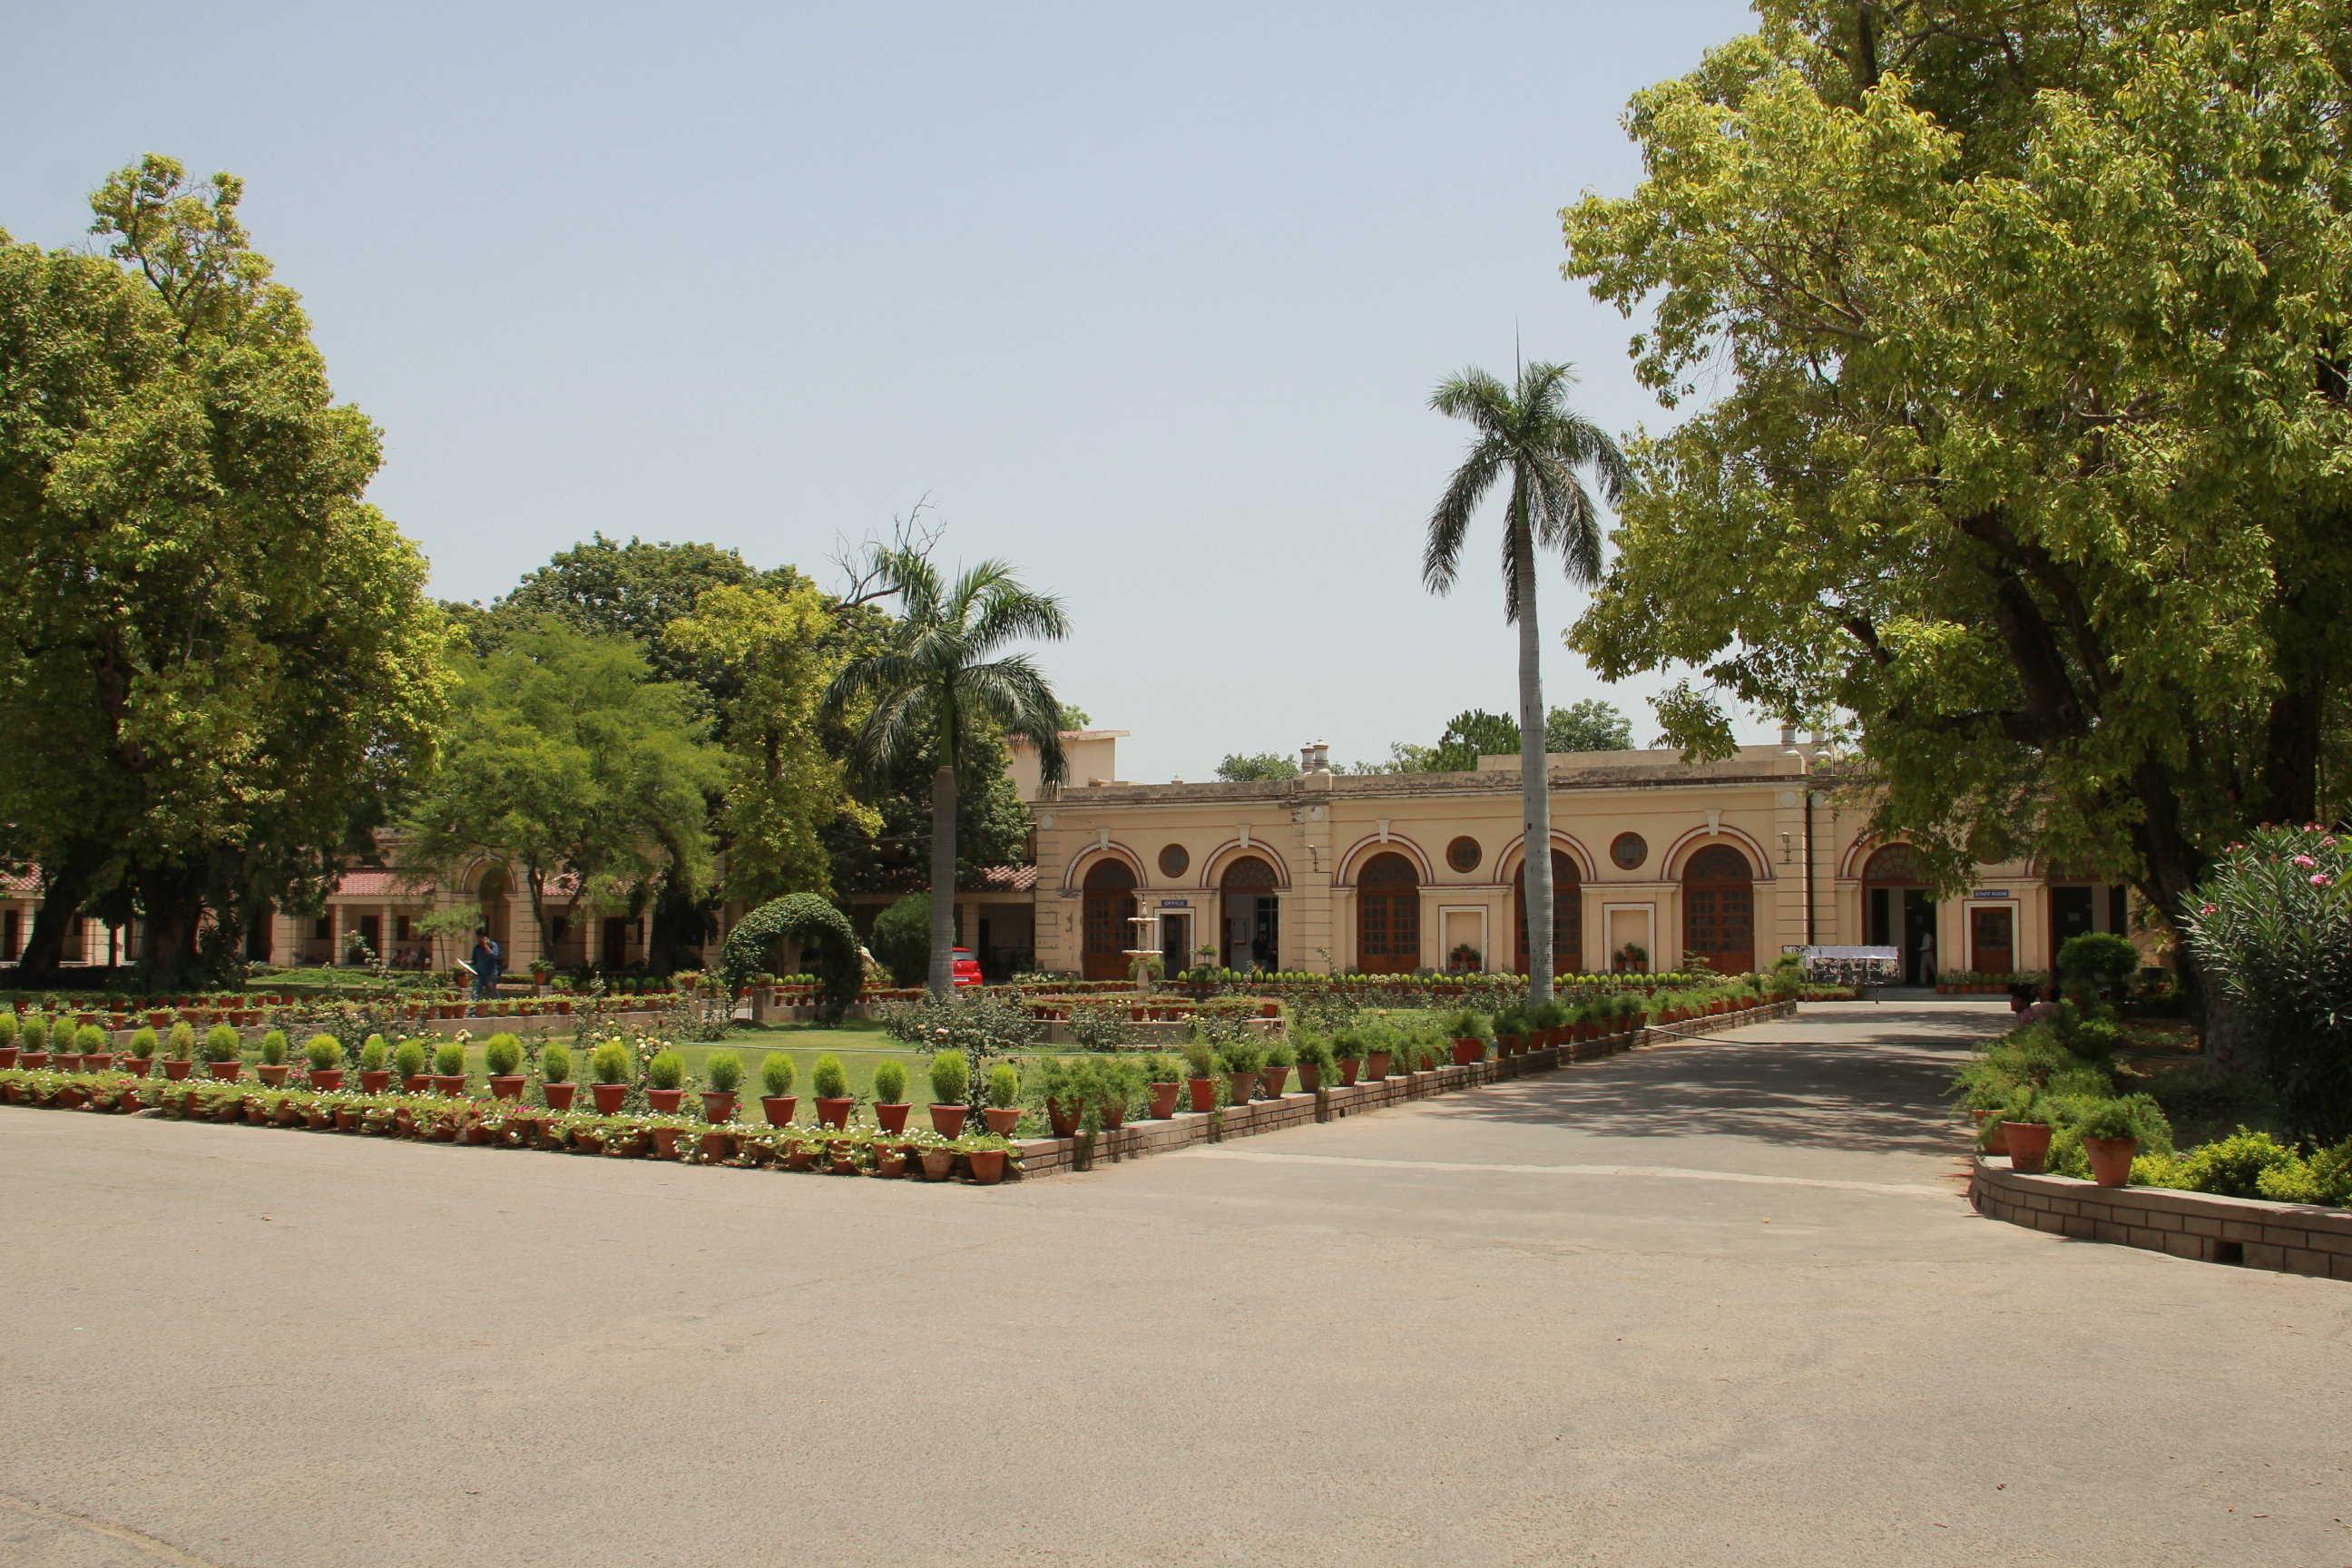 Ip-women-college-north-campus-delhi-university-ipcw-coho